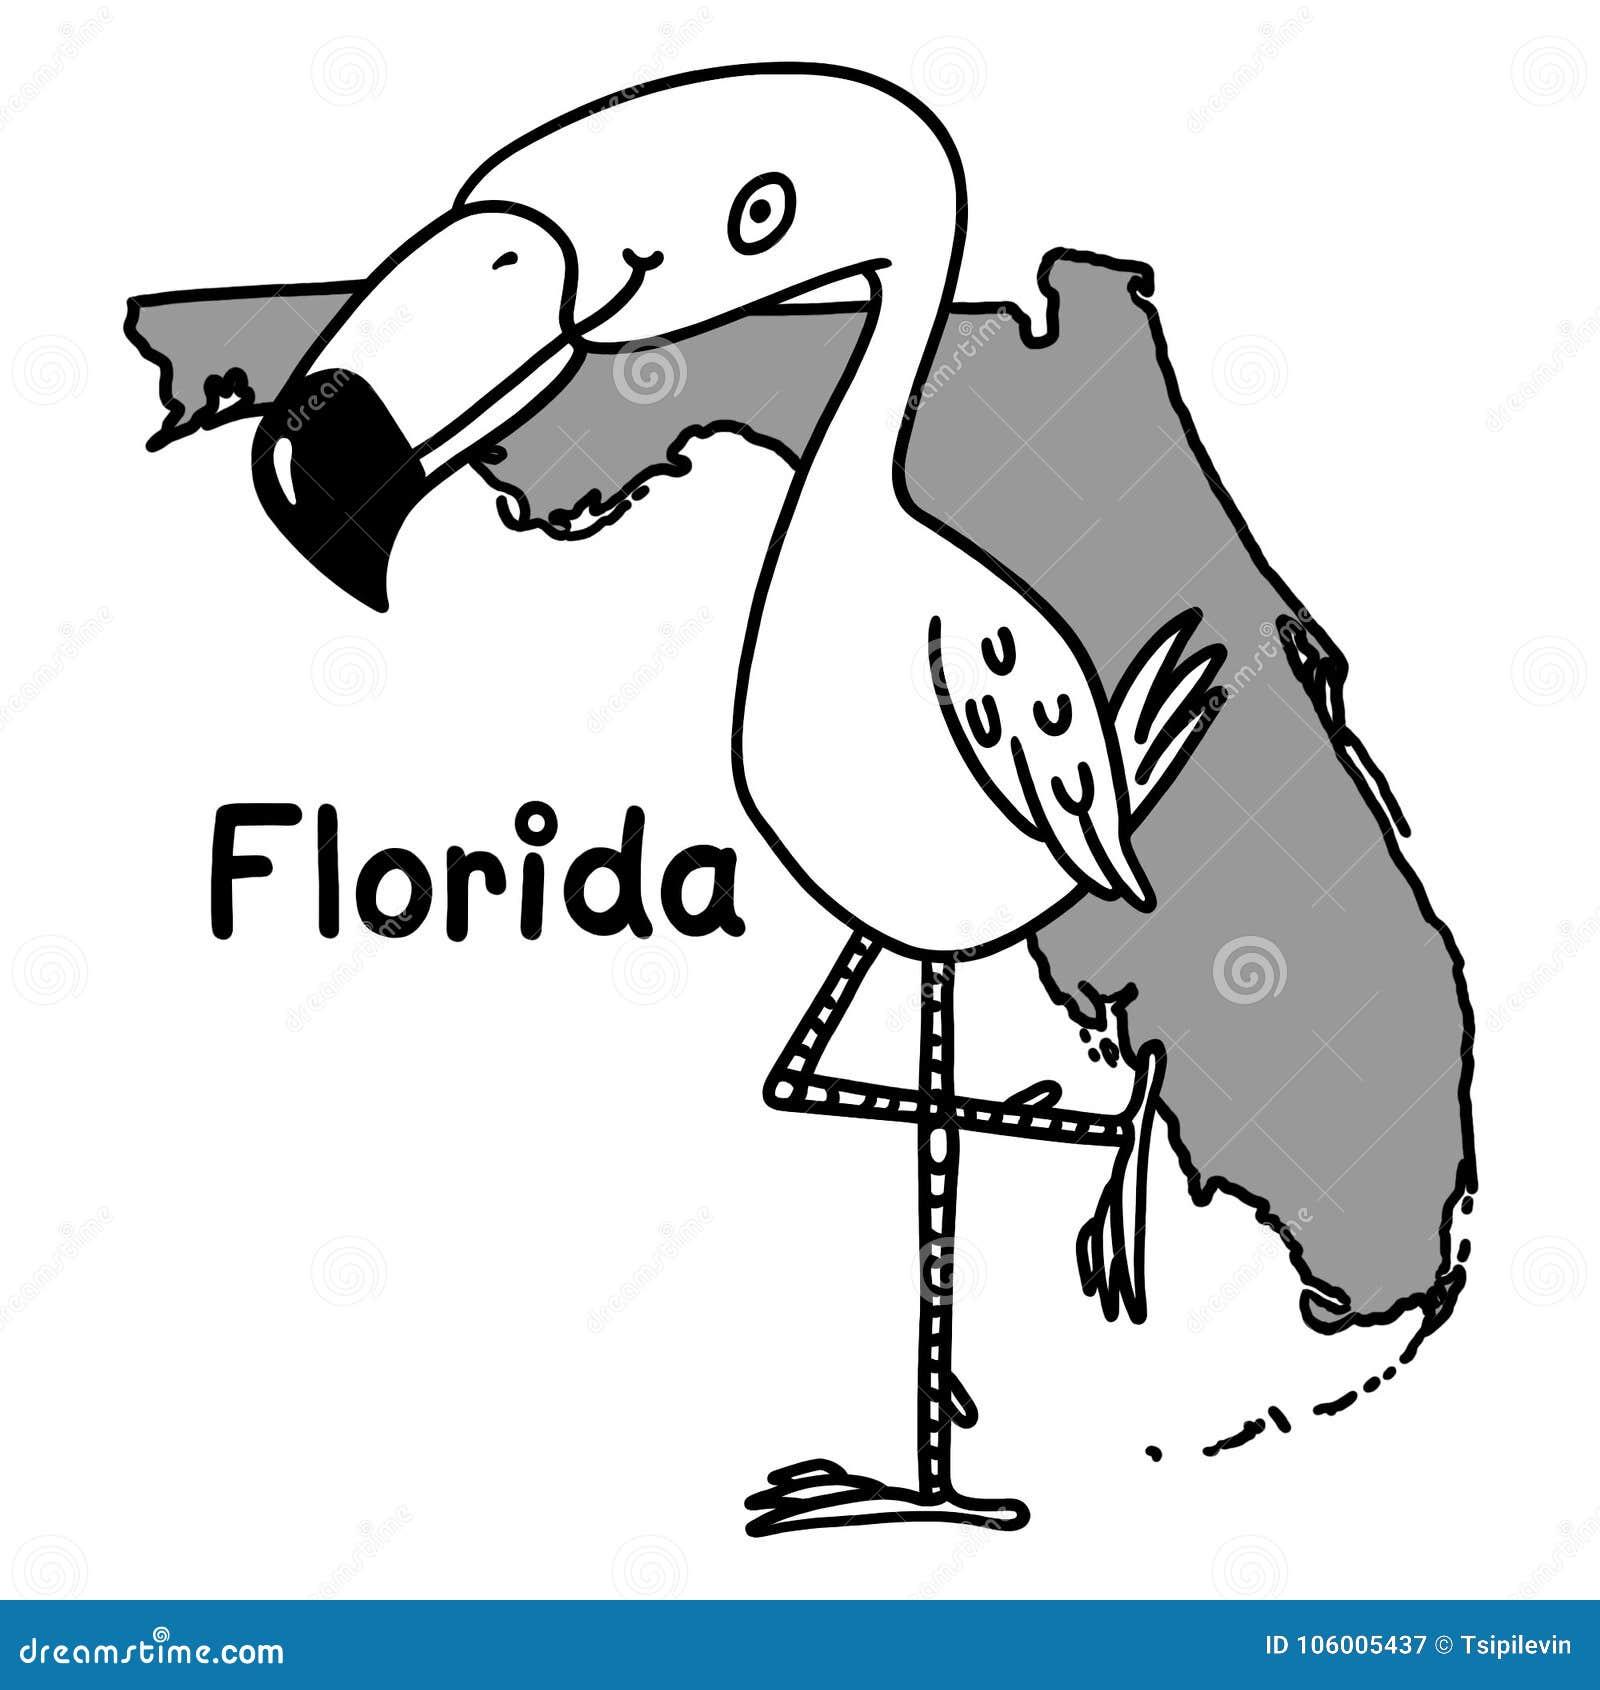 Florida Map Outline.Flamingo Bird Over Florida Map Outline Cartoon Stock Illustration